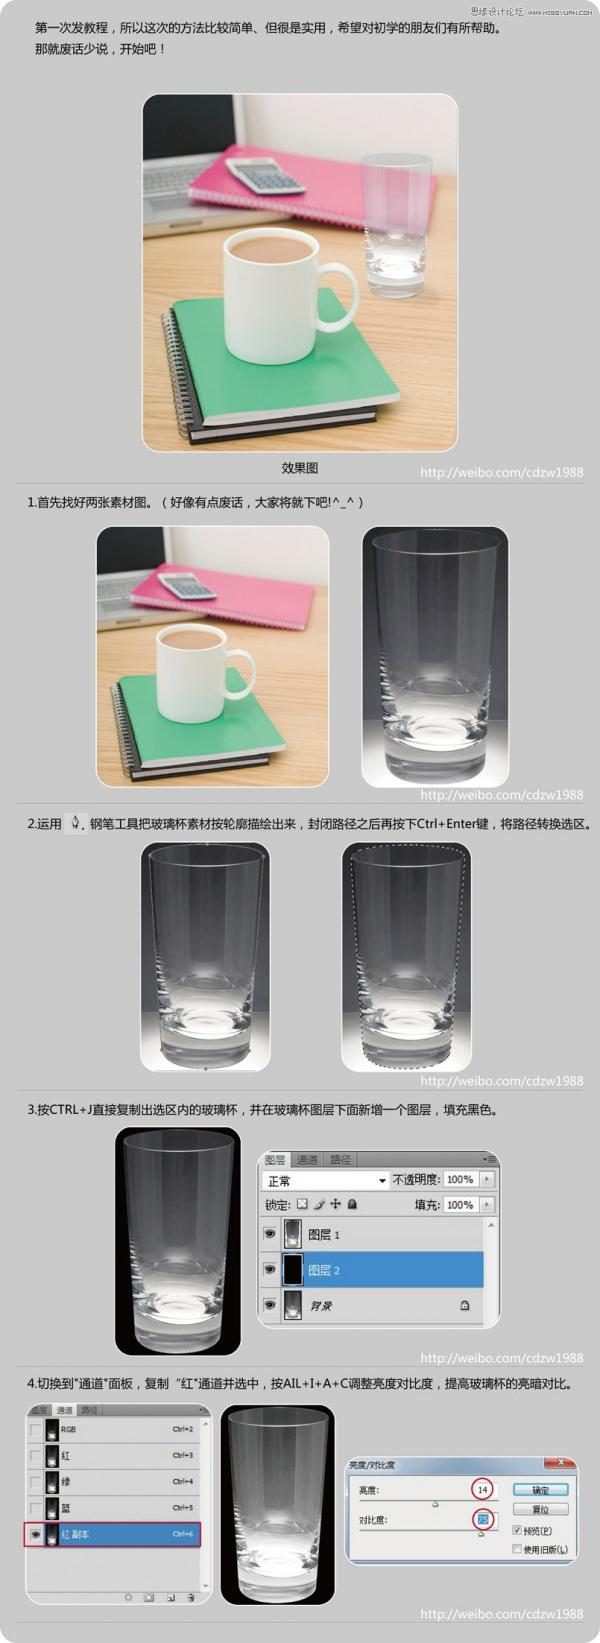 Photoshop利用通道抠出透明玻璃杯子